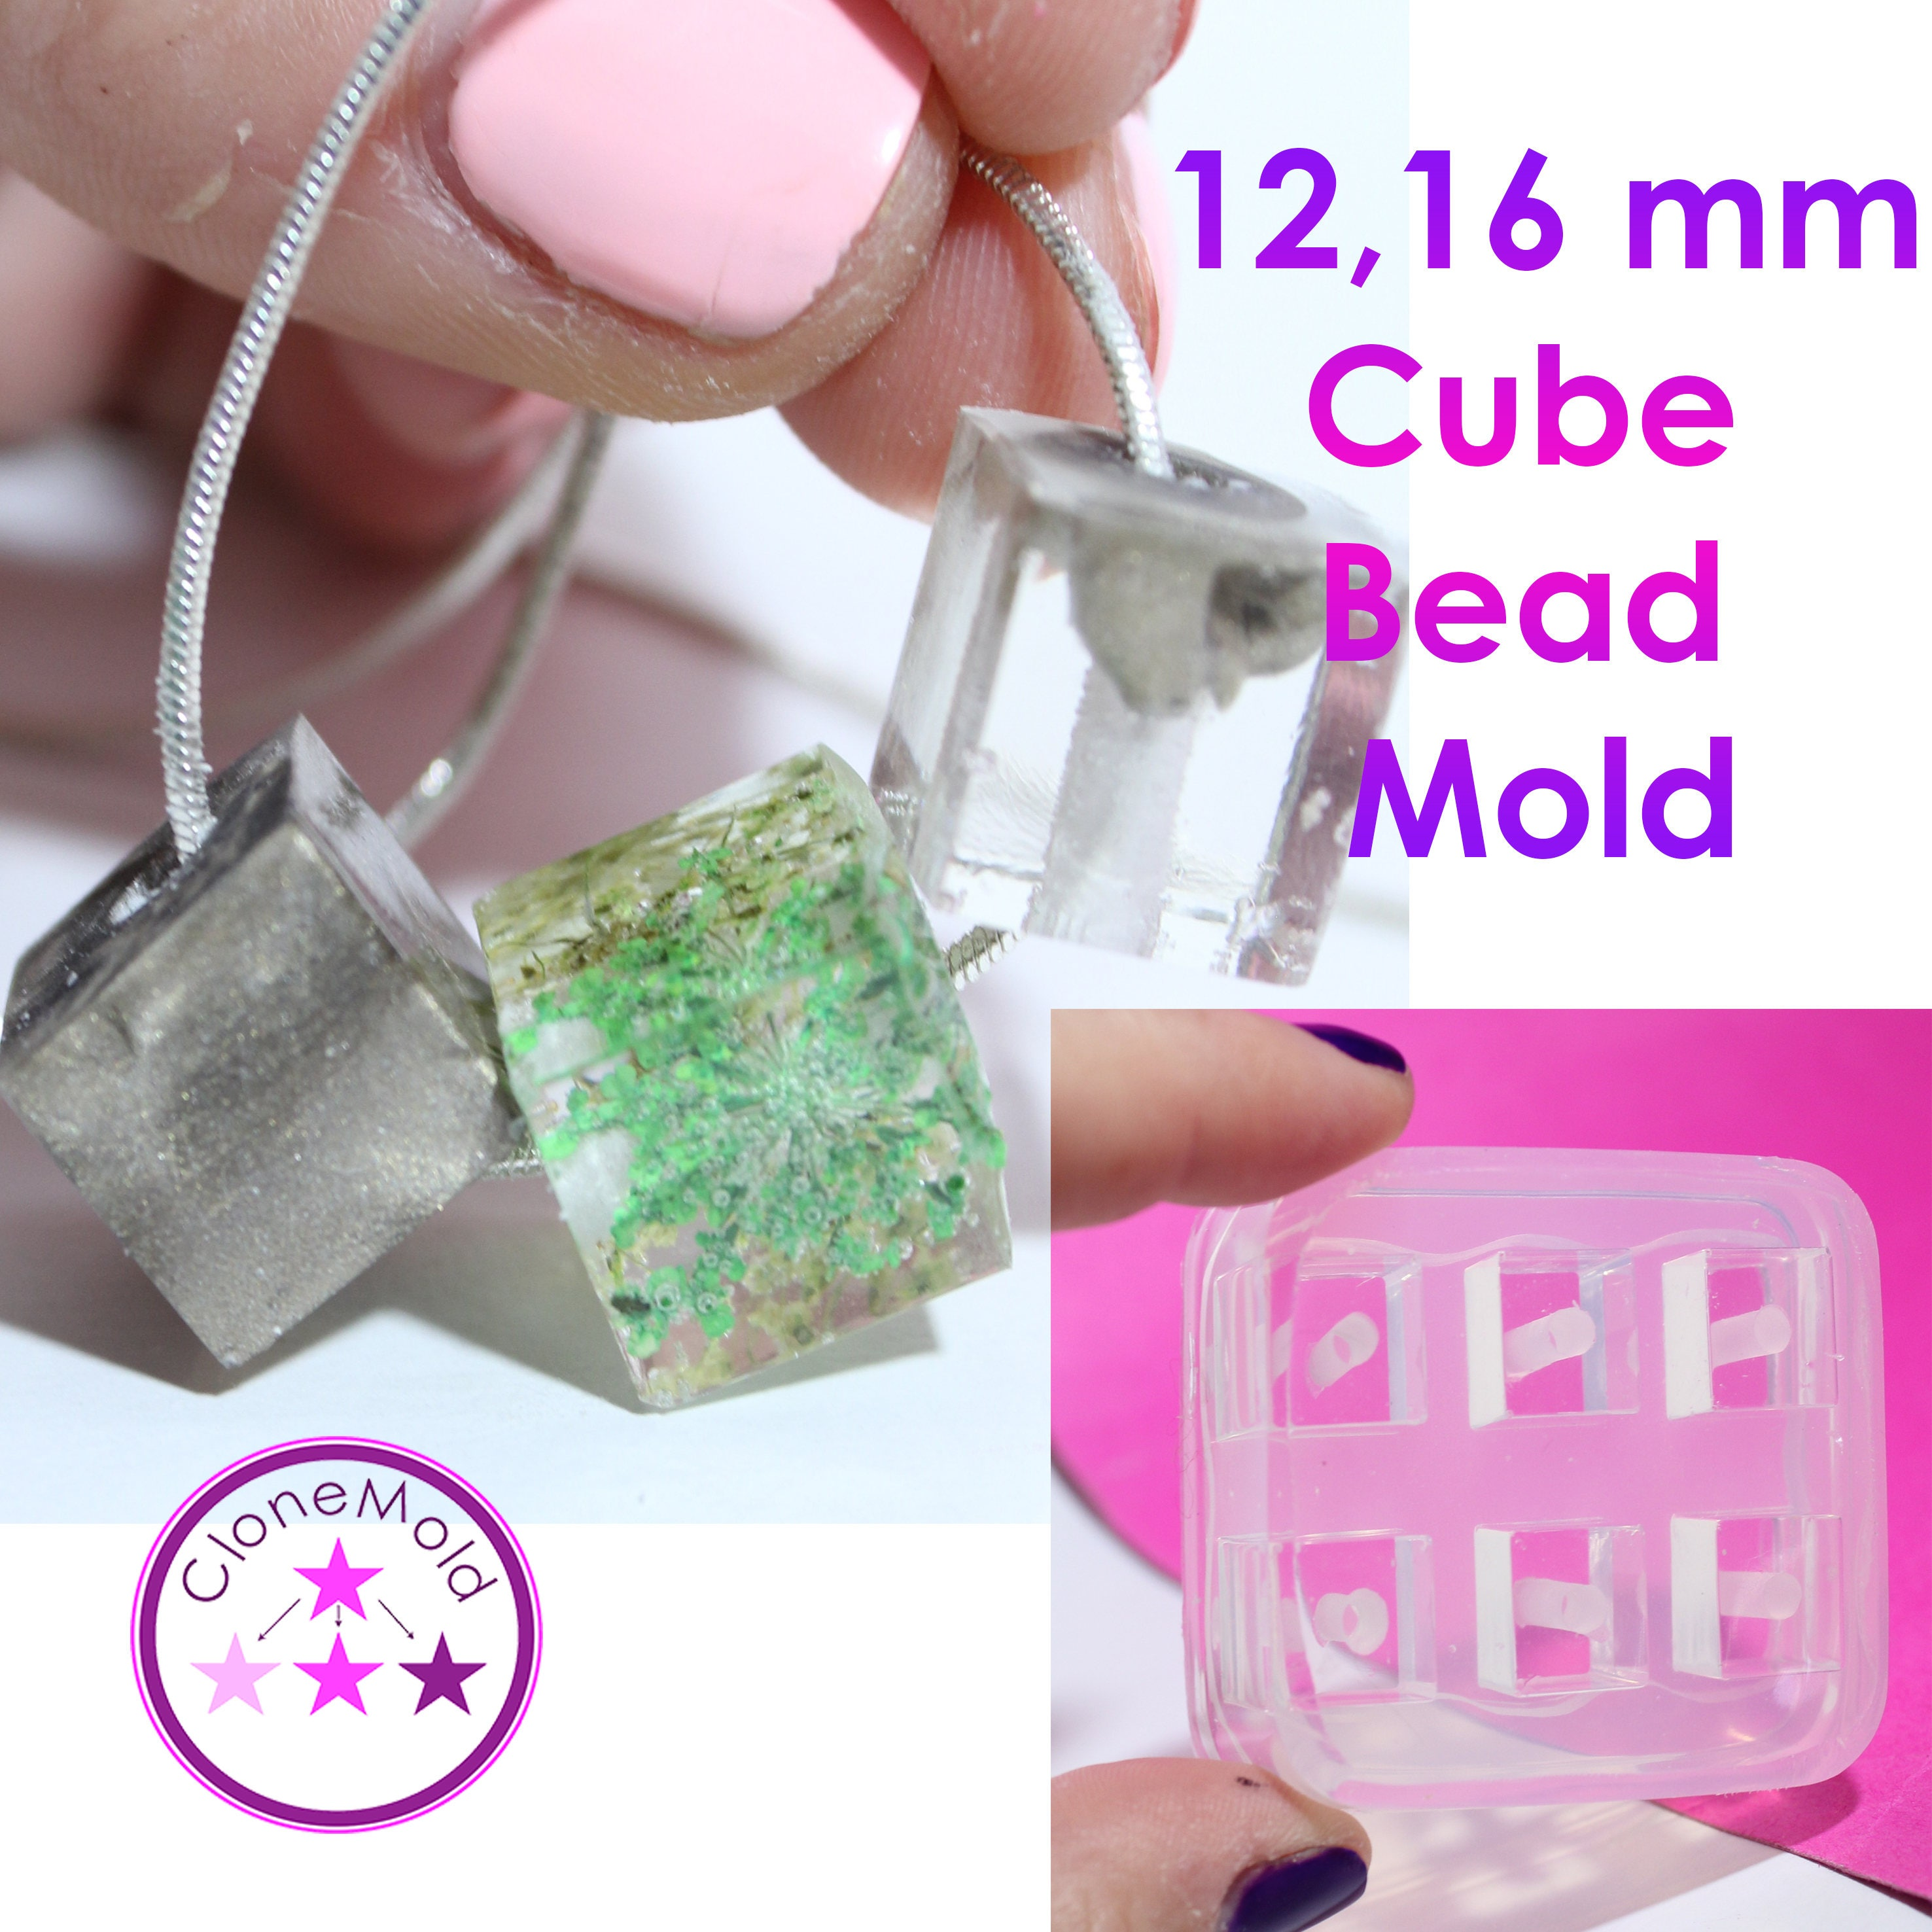 Cube Bead Mold Square Silicone Silicone Silicone Rubber; 6 Pieces; 12 or 16 mm fb6856